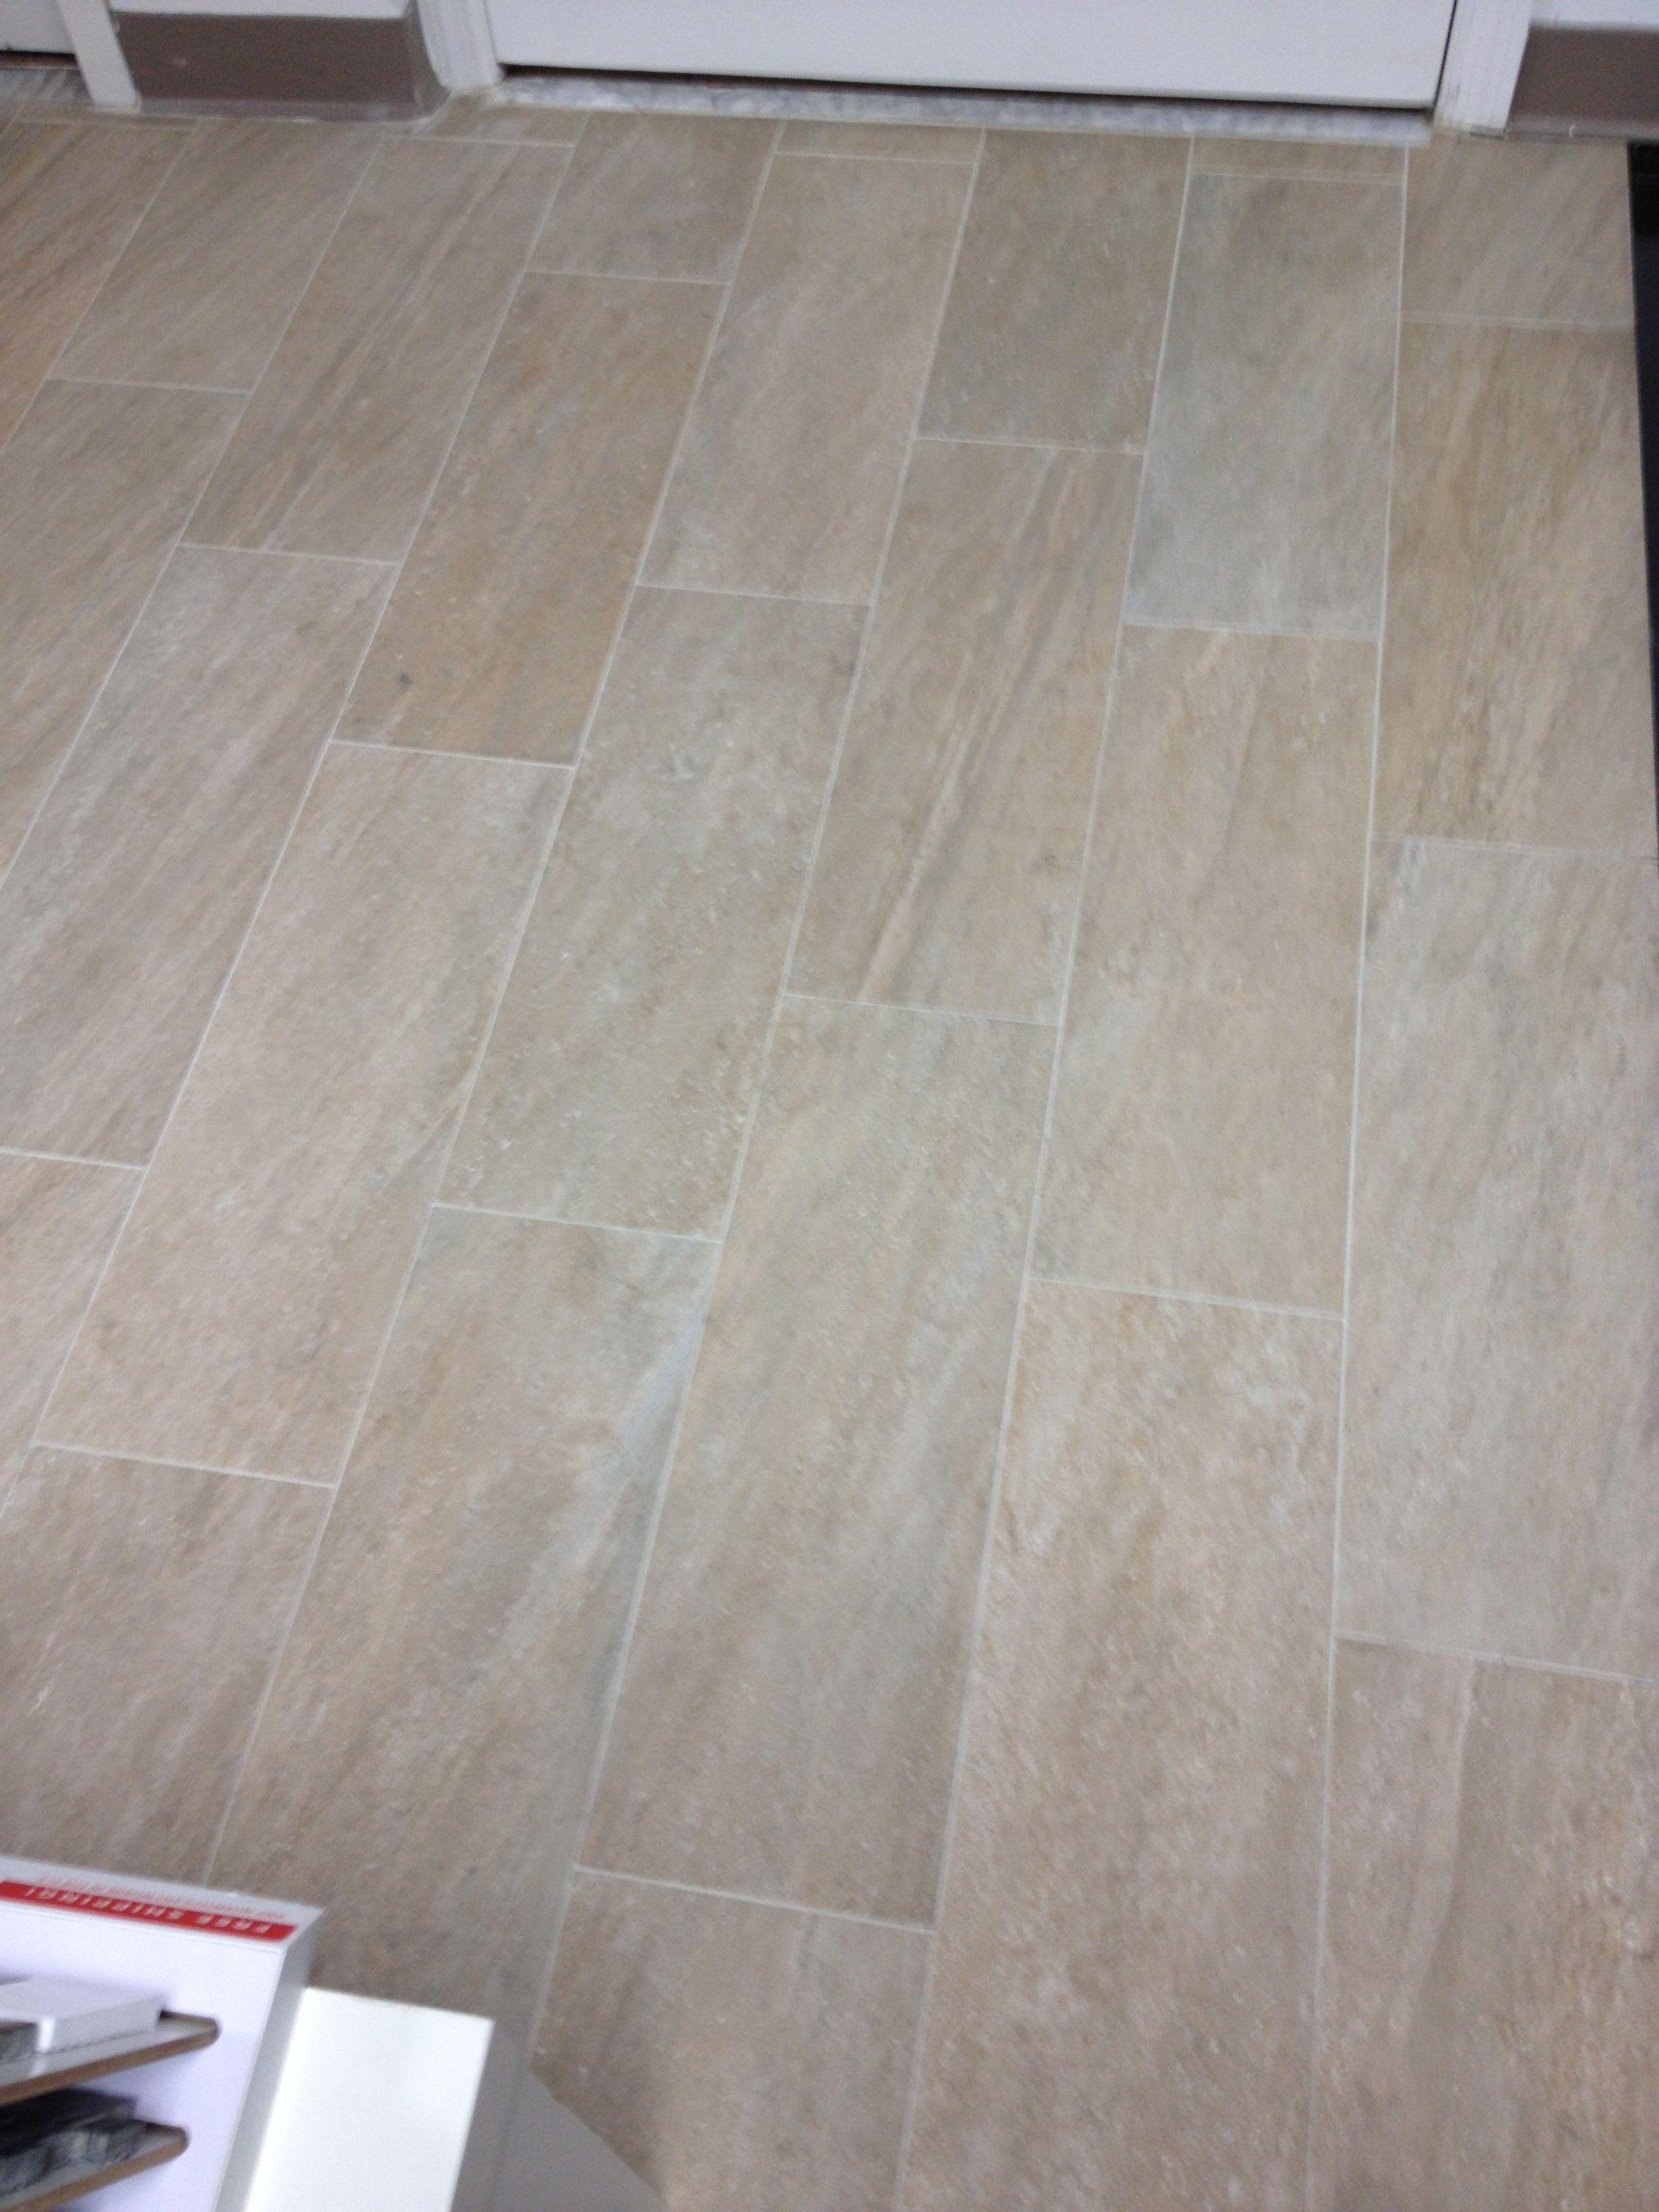 Purchased Lefka Floor Tile With Minimal Grout Lines Tiles Tile Floor Flooring